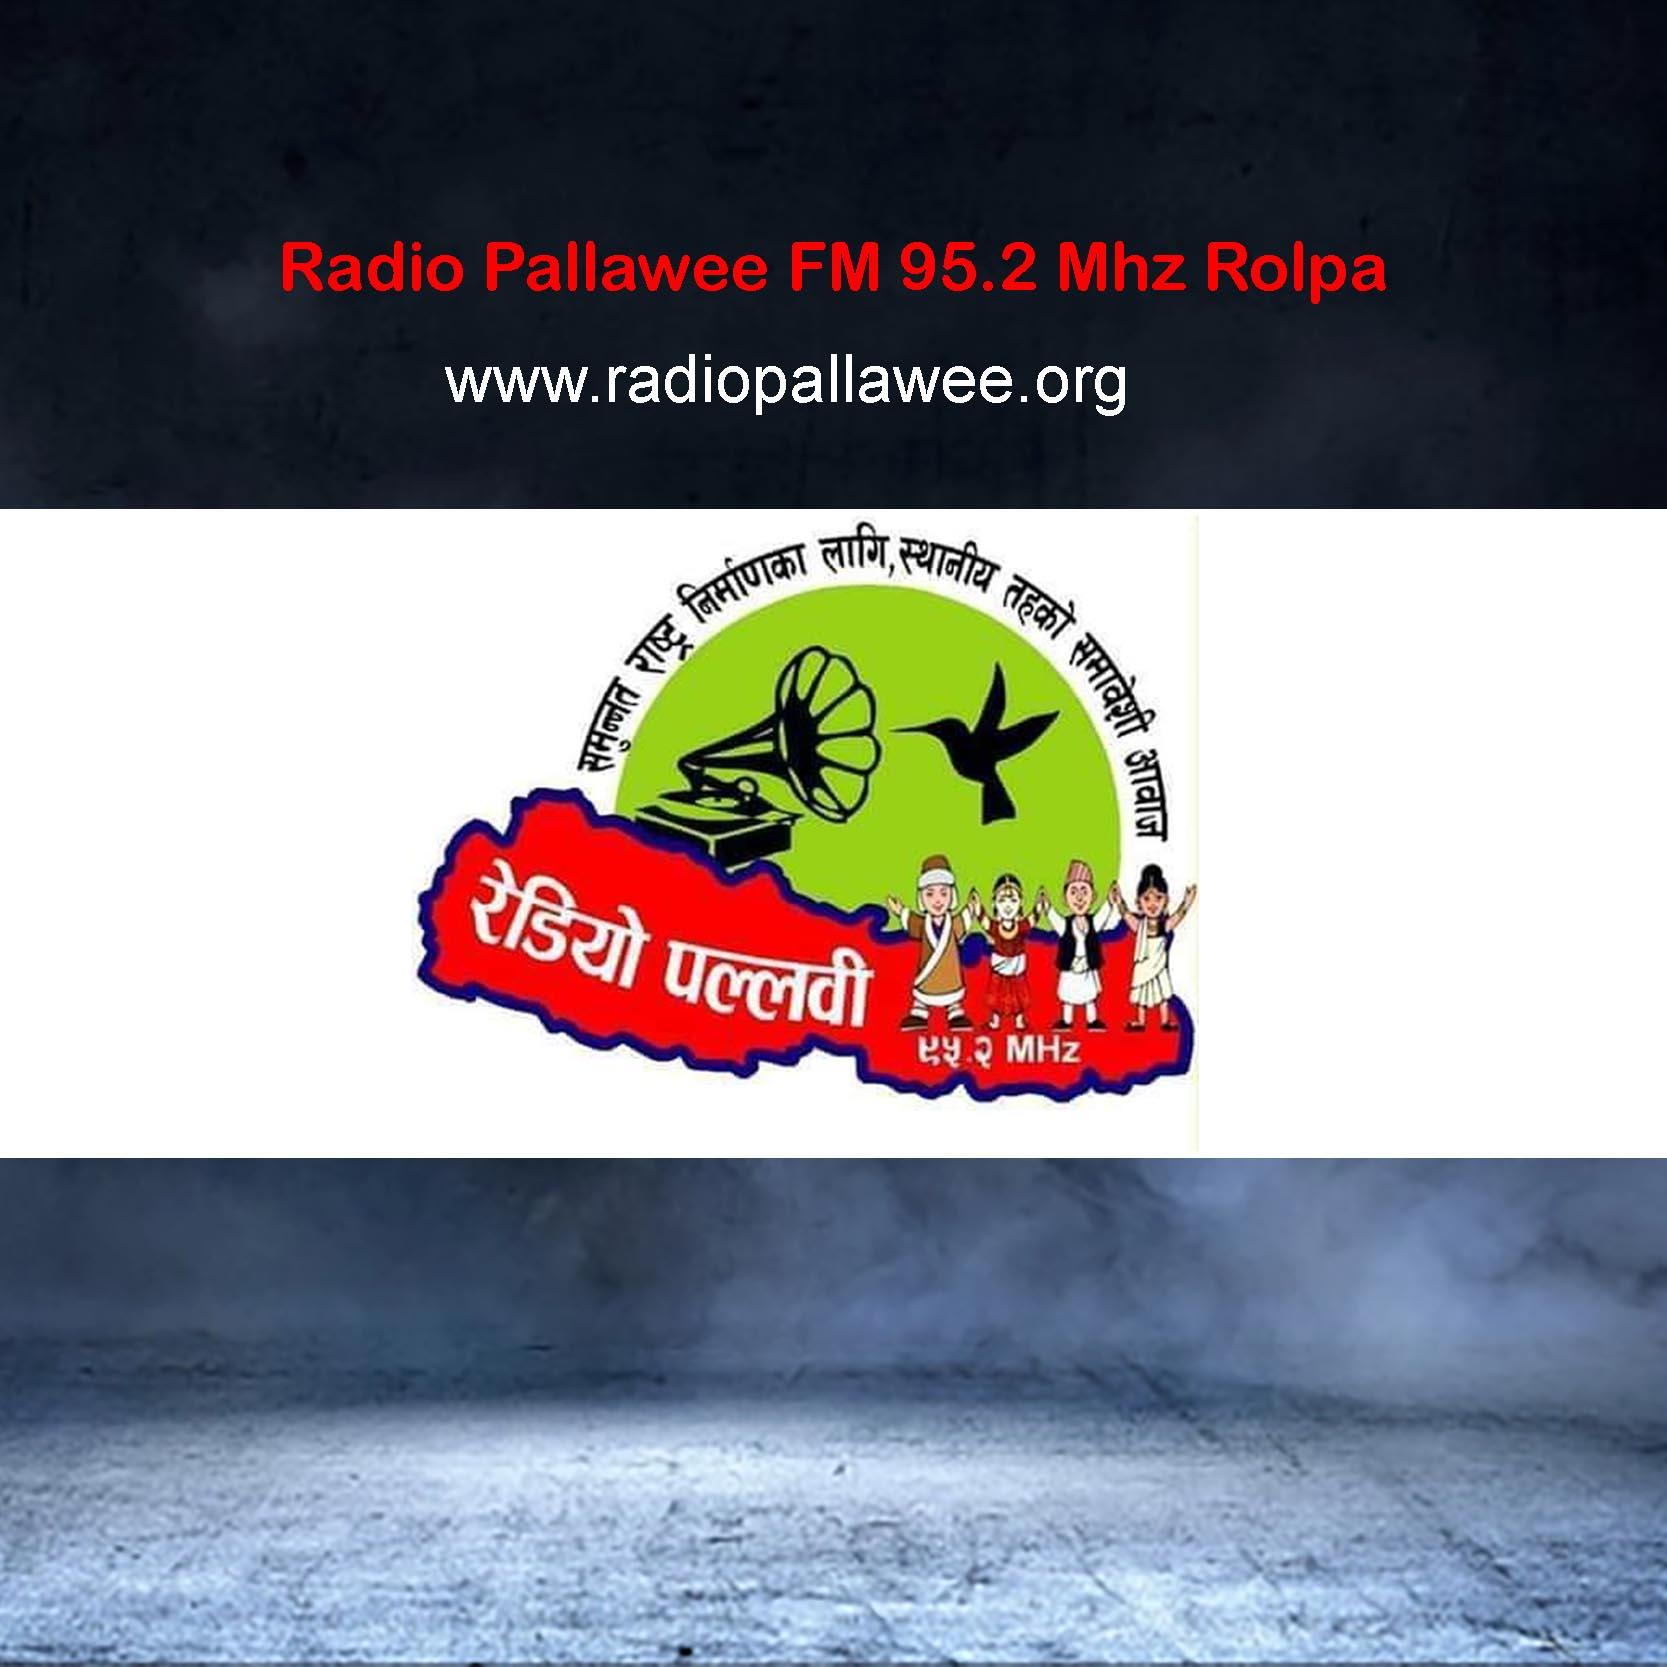 Radio Pallawee FM 95.2 Mhz Rolpa